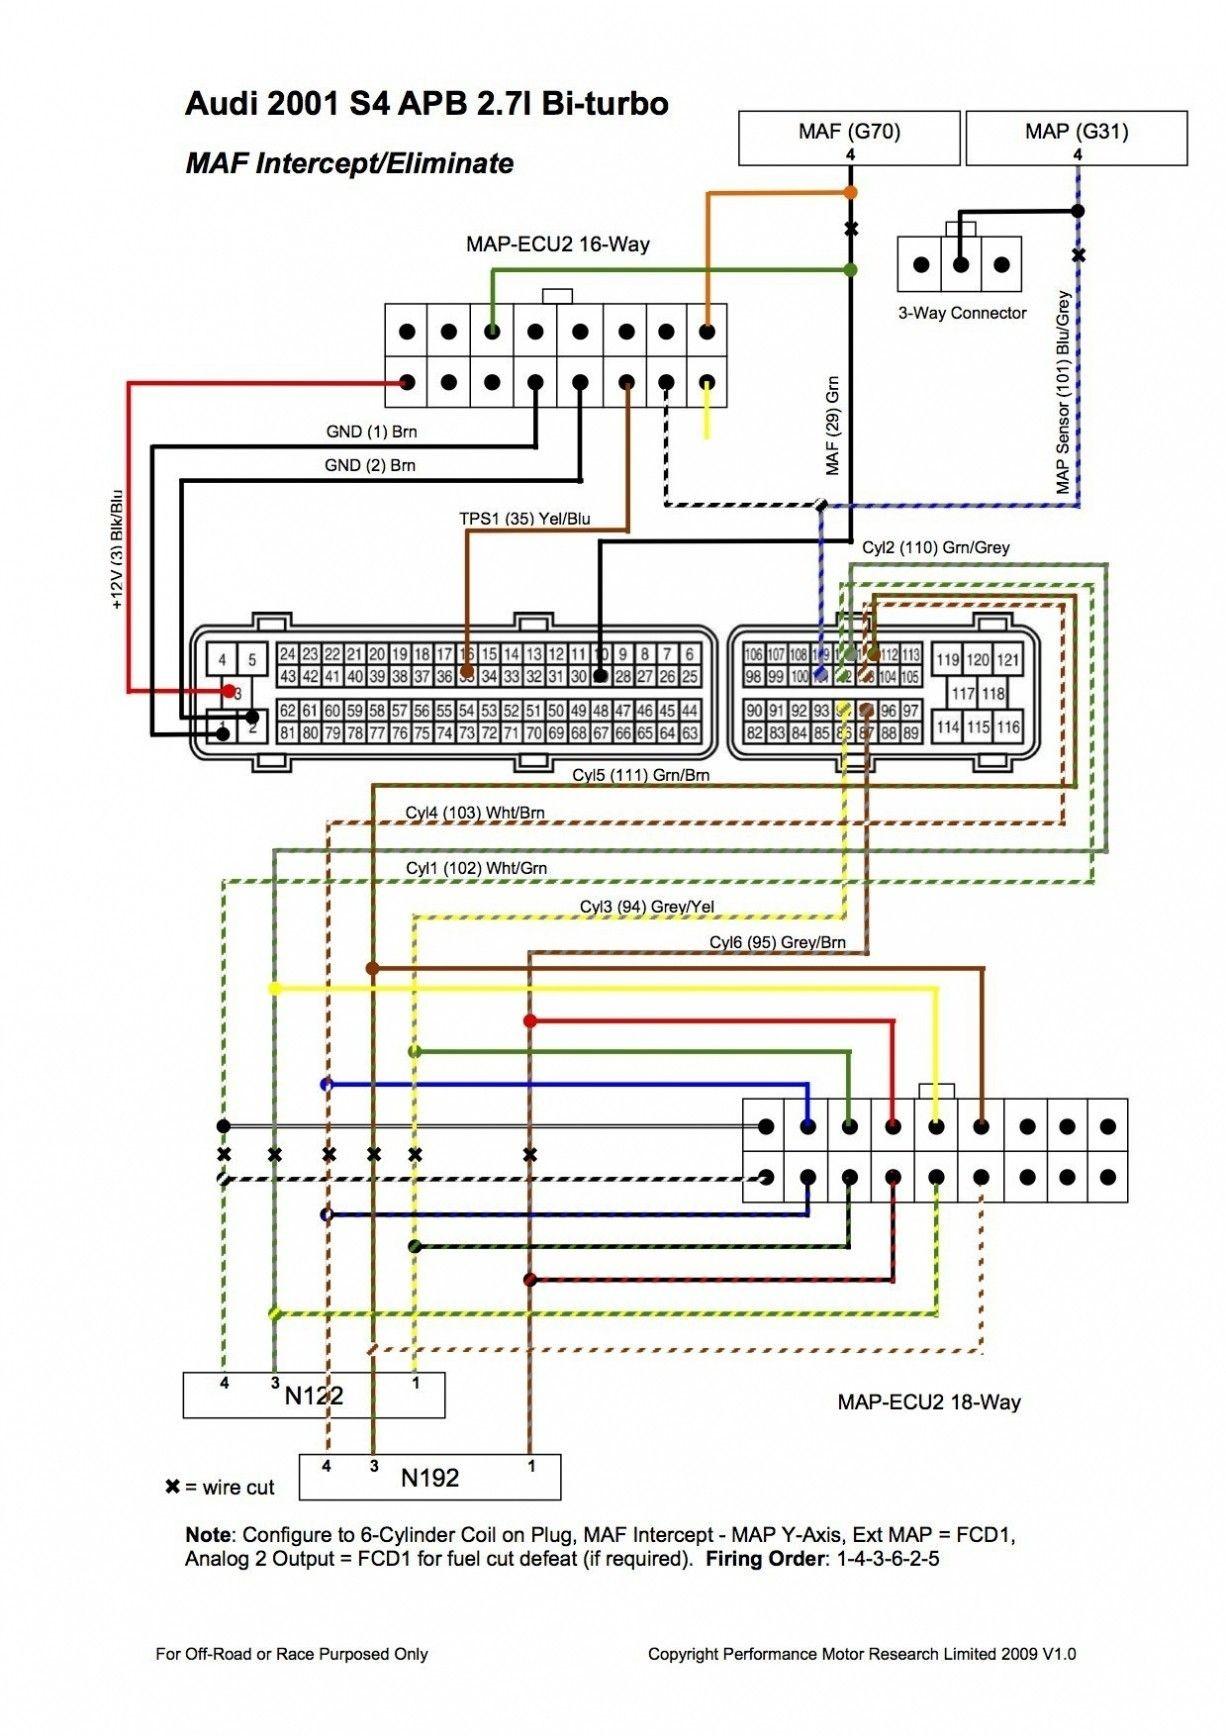 Wiring Dia Audi A2 Wiring Diagram for Audi A4 towbar Diagram Diagramtemplate Of Wiring Dia Audi A2